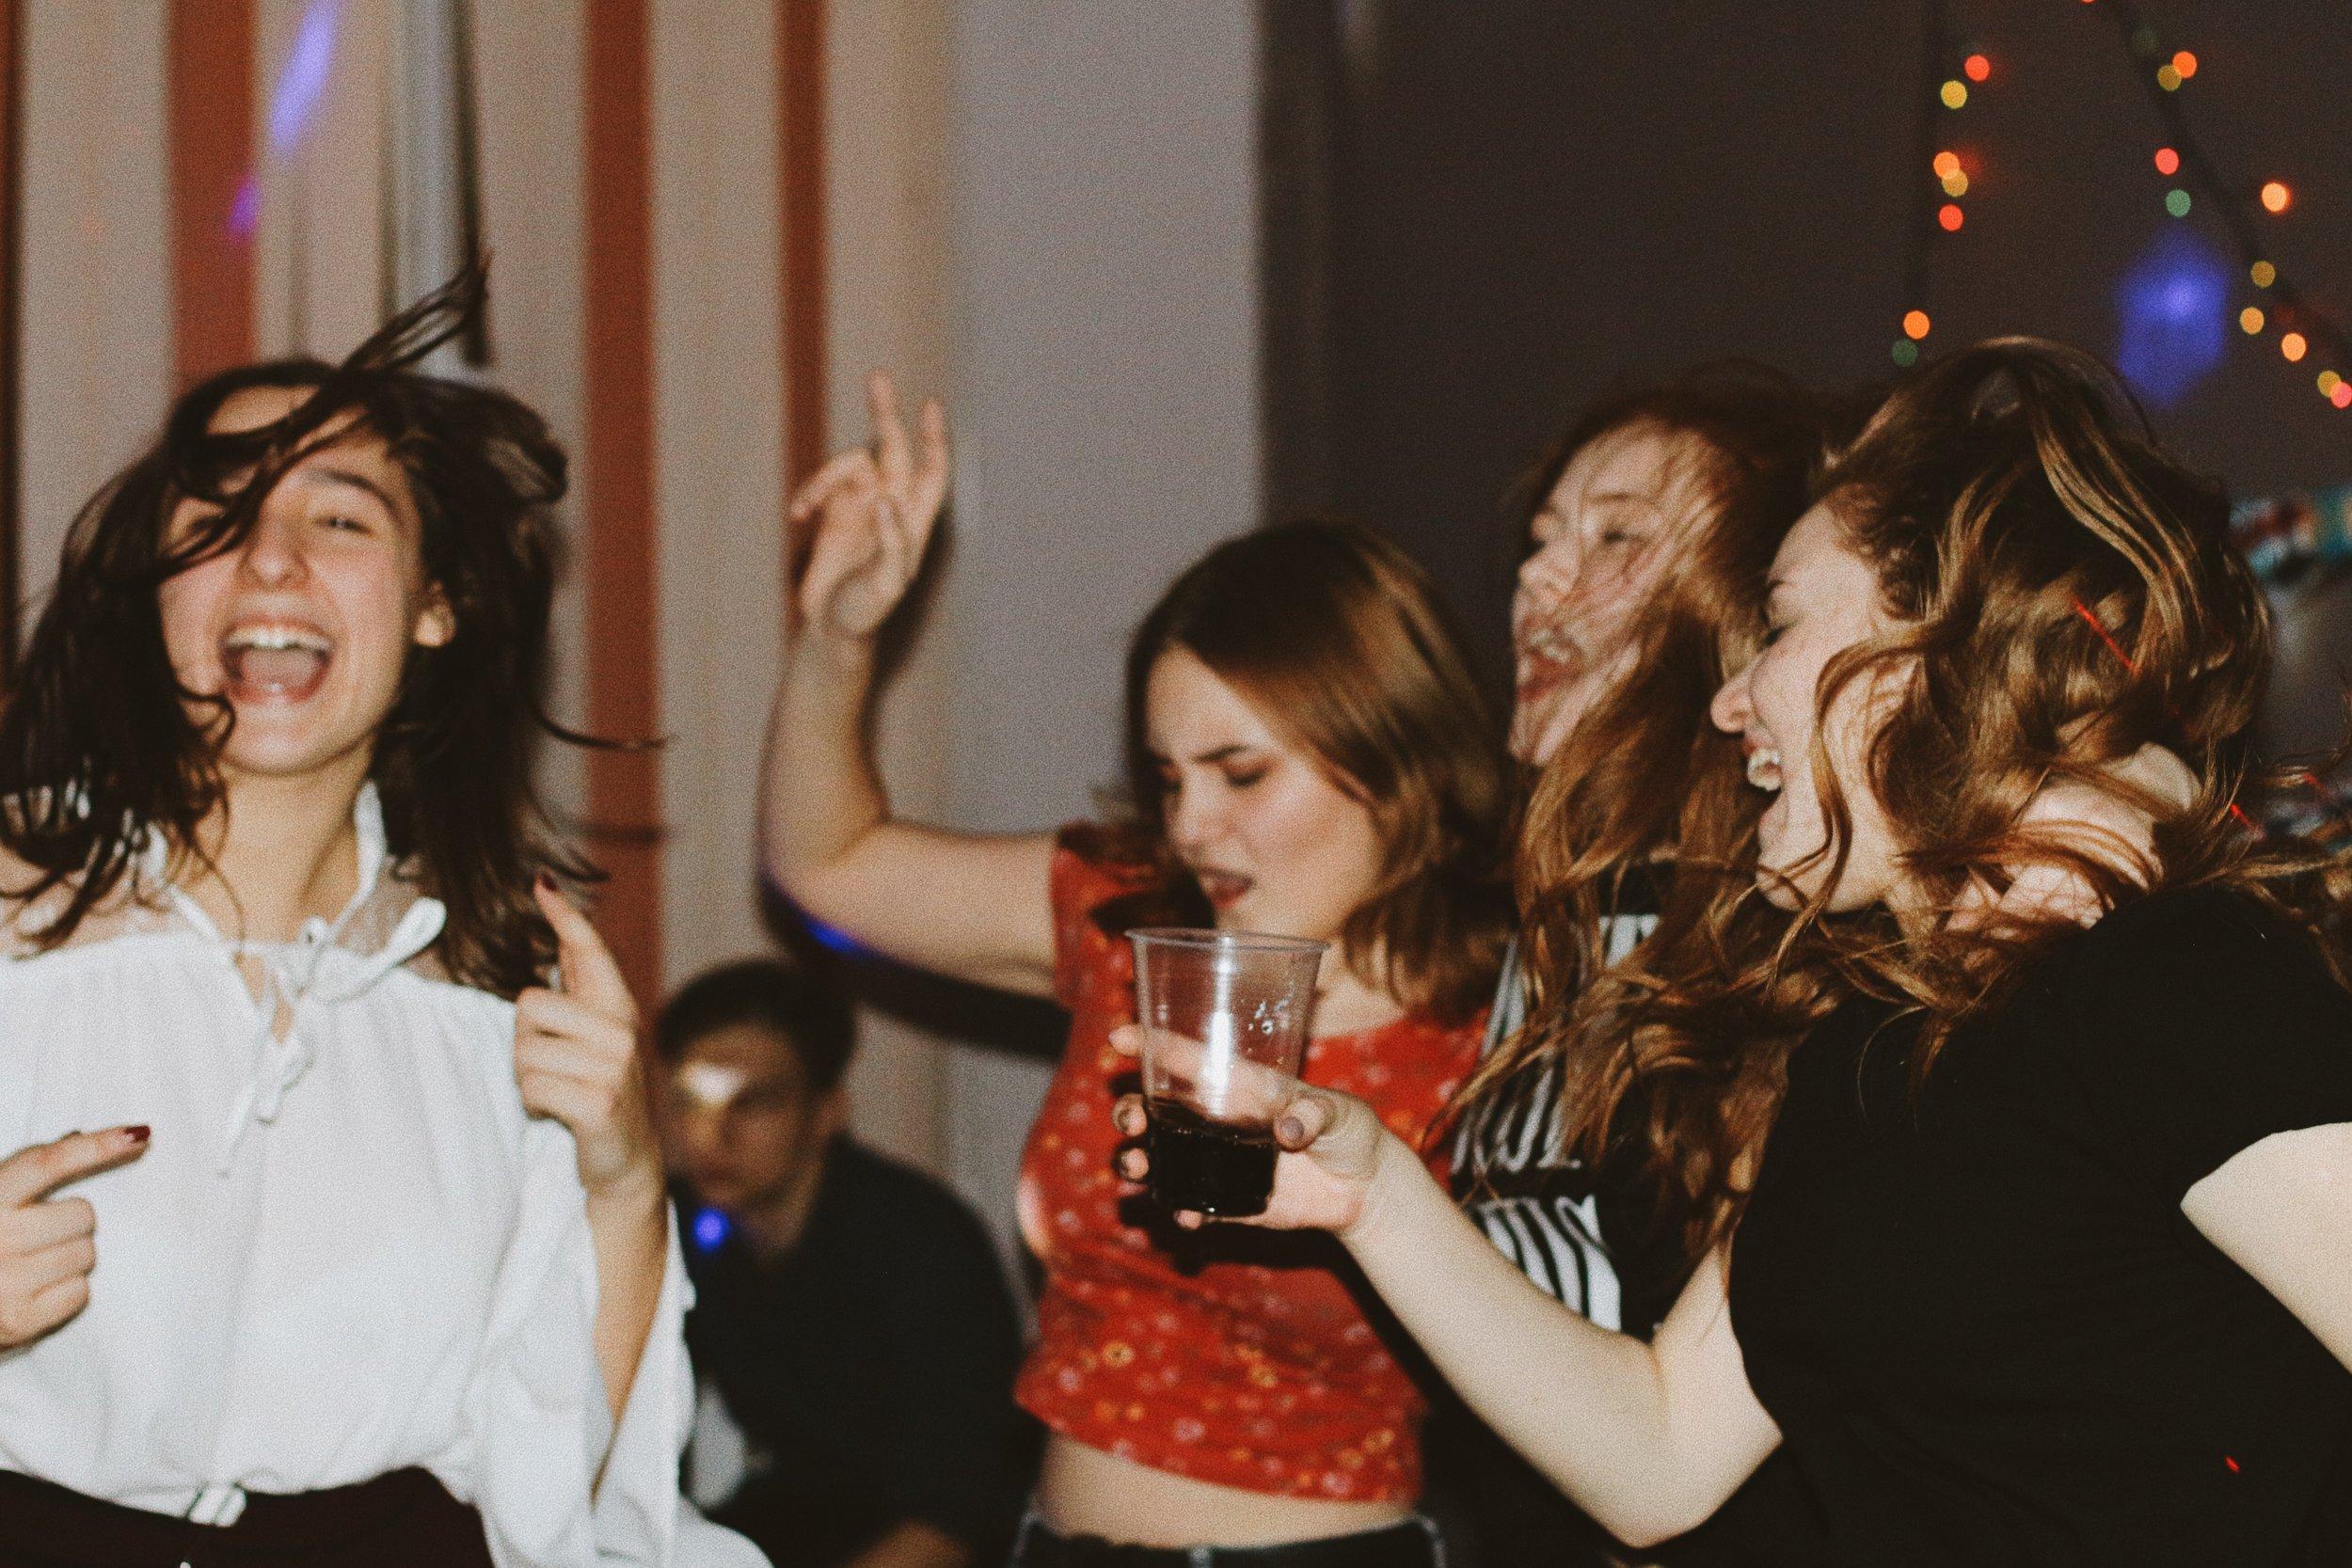 Cheers to the New Year  - ADVANCED |  Julia Petrachkova